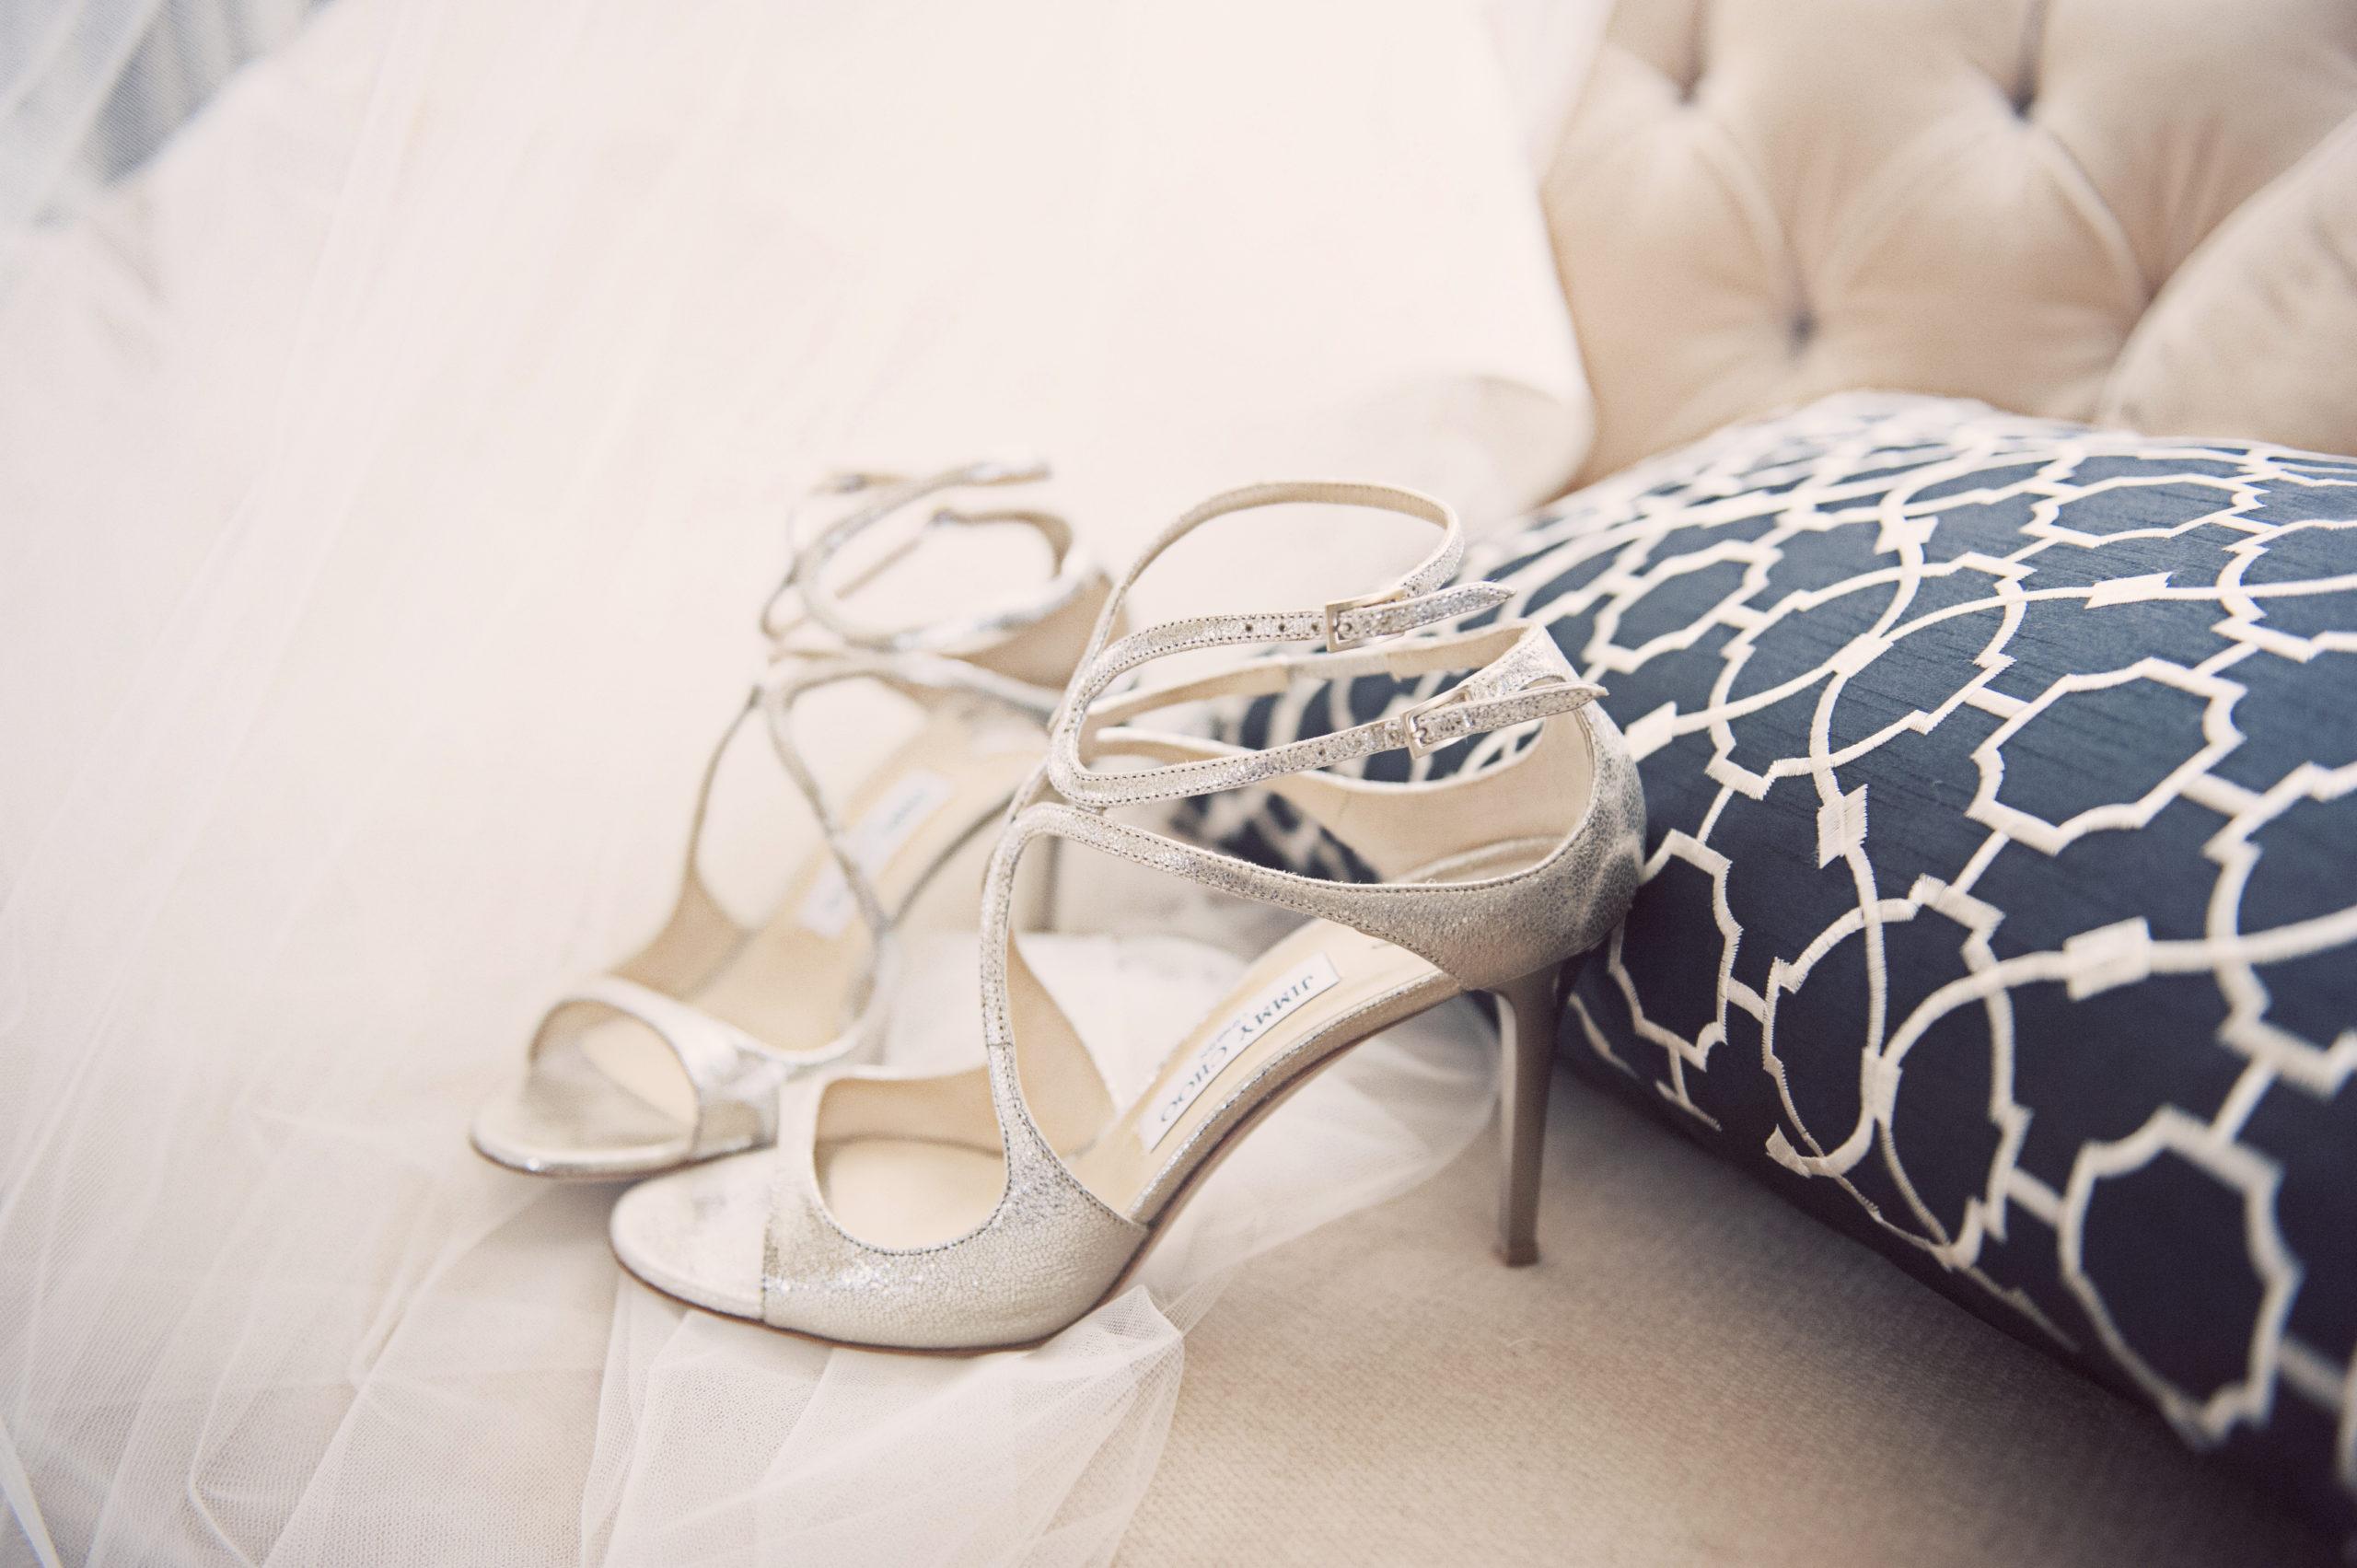 Classic Hollywood Wedding California I Dee Kay Events I New Jersey Wedding Planner I Wedding Shoes